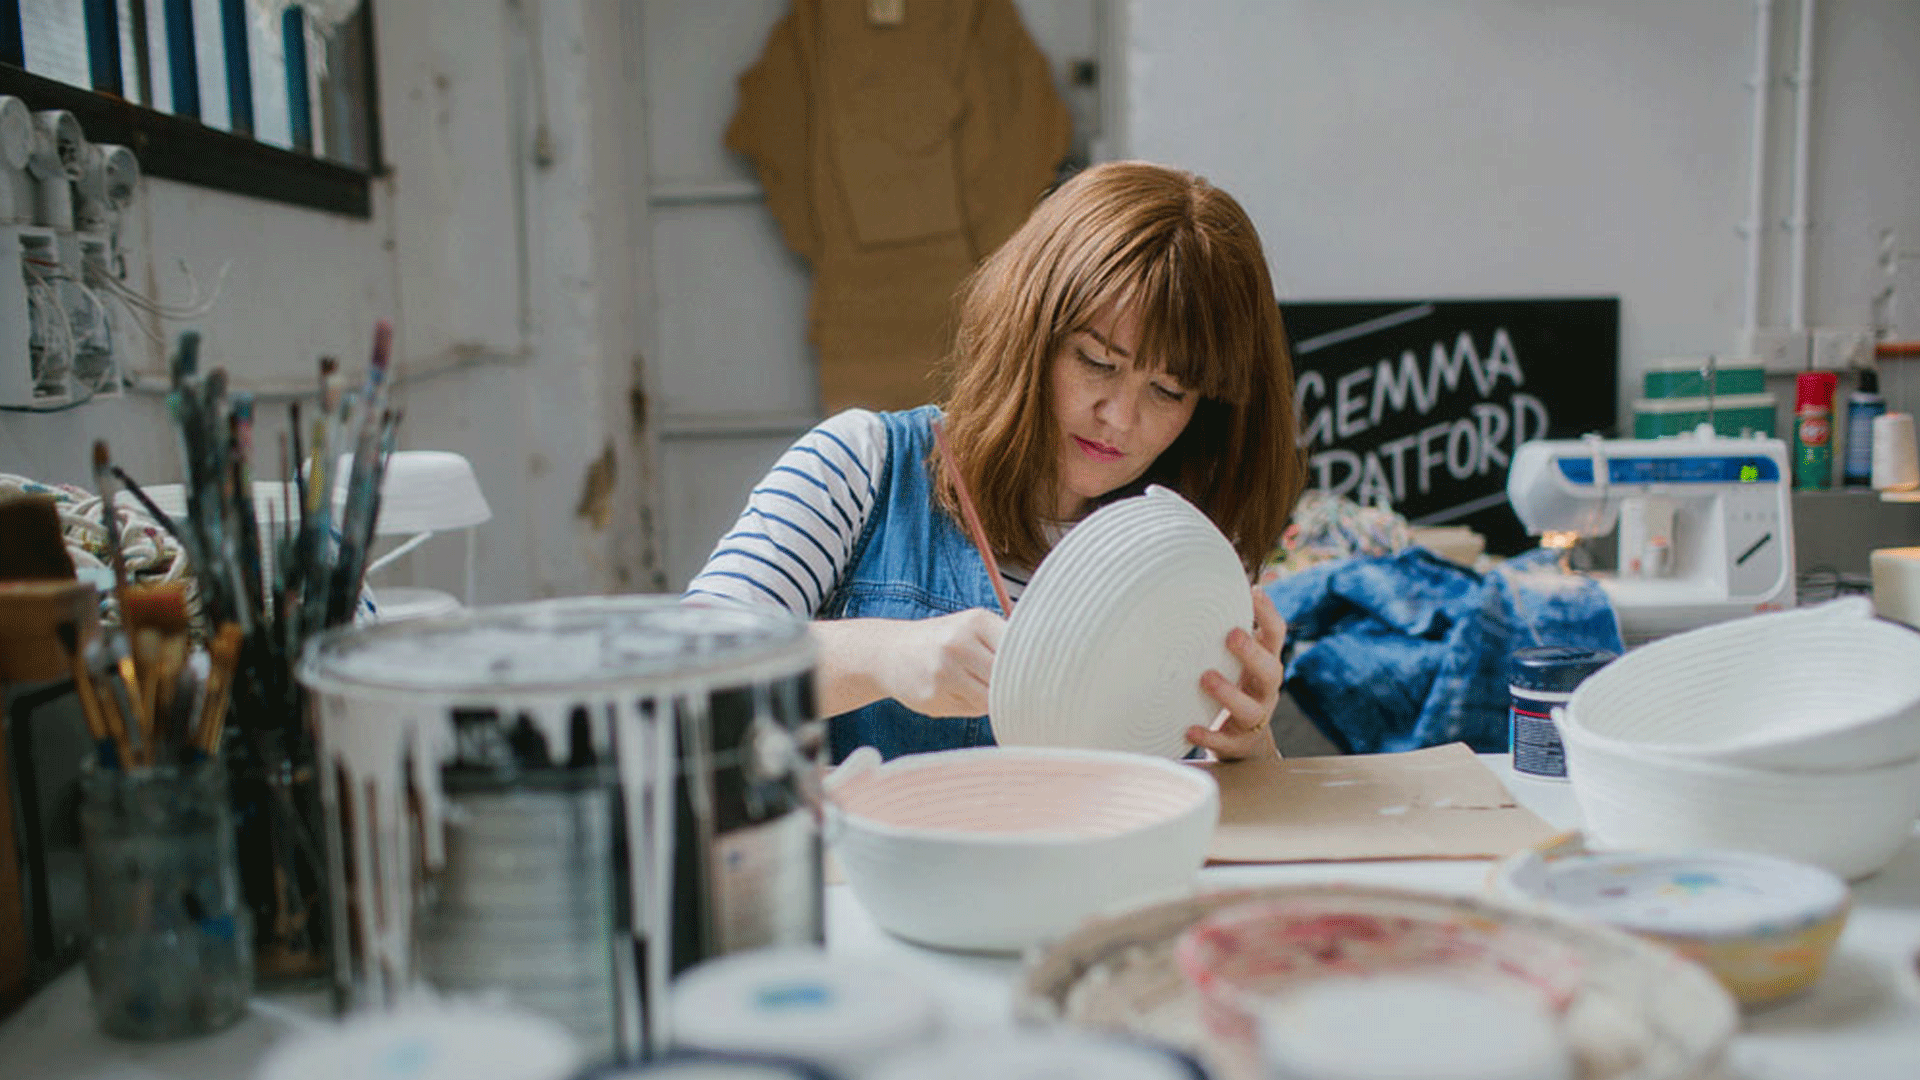 Gemma Patford's Melbourne Studio